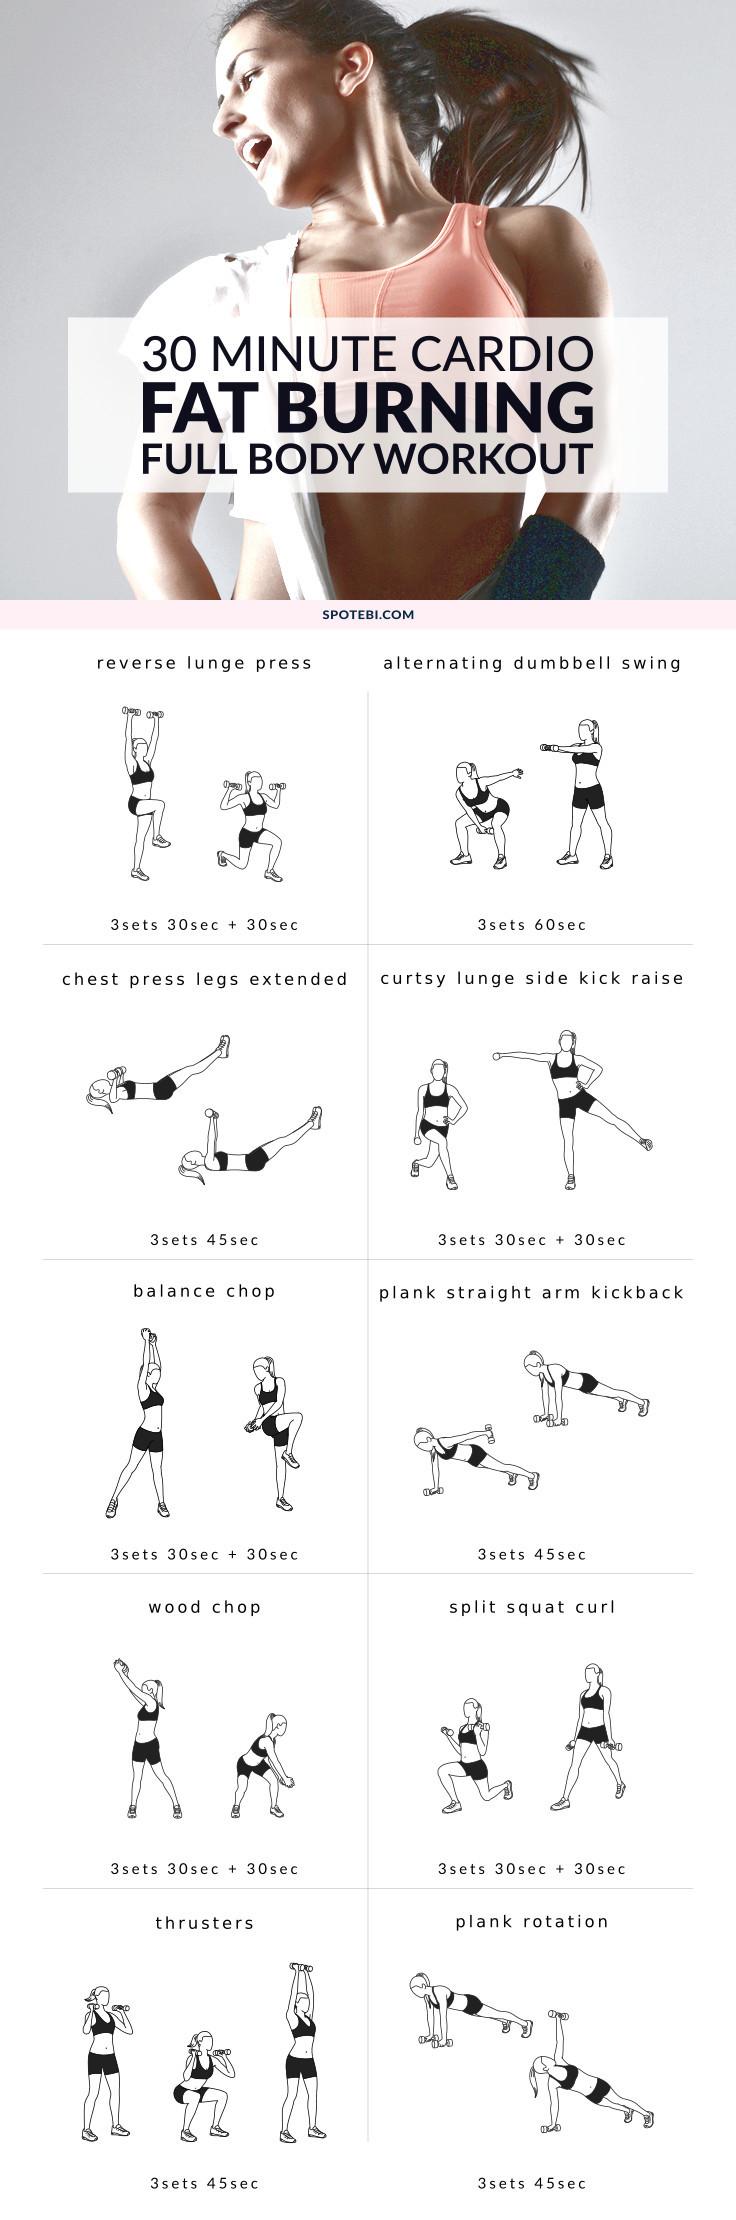 Fat Burning Workout For Men Full Body  30 Minute Full Body Fat Burning Workout